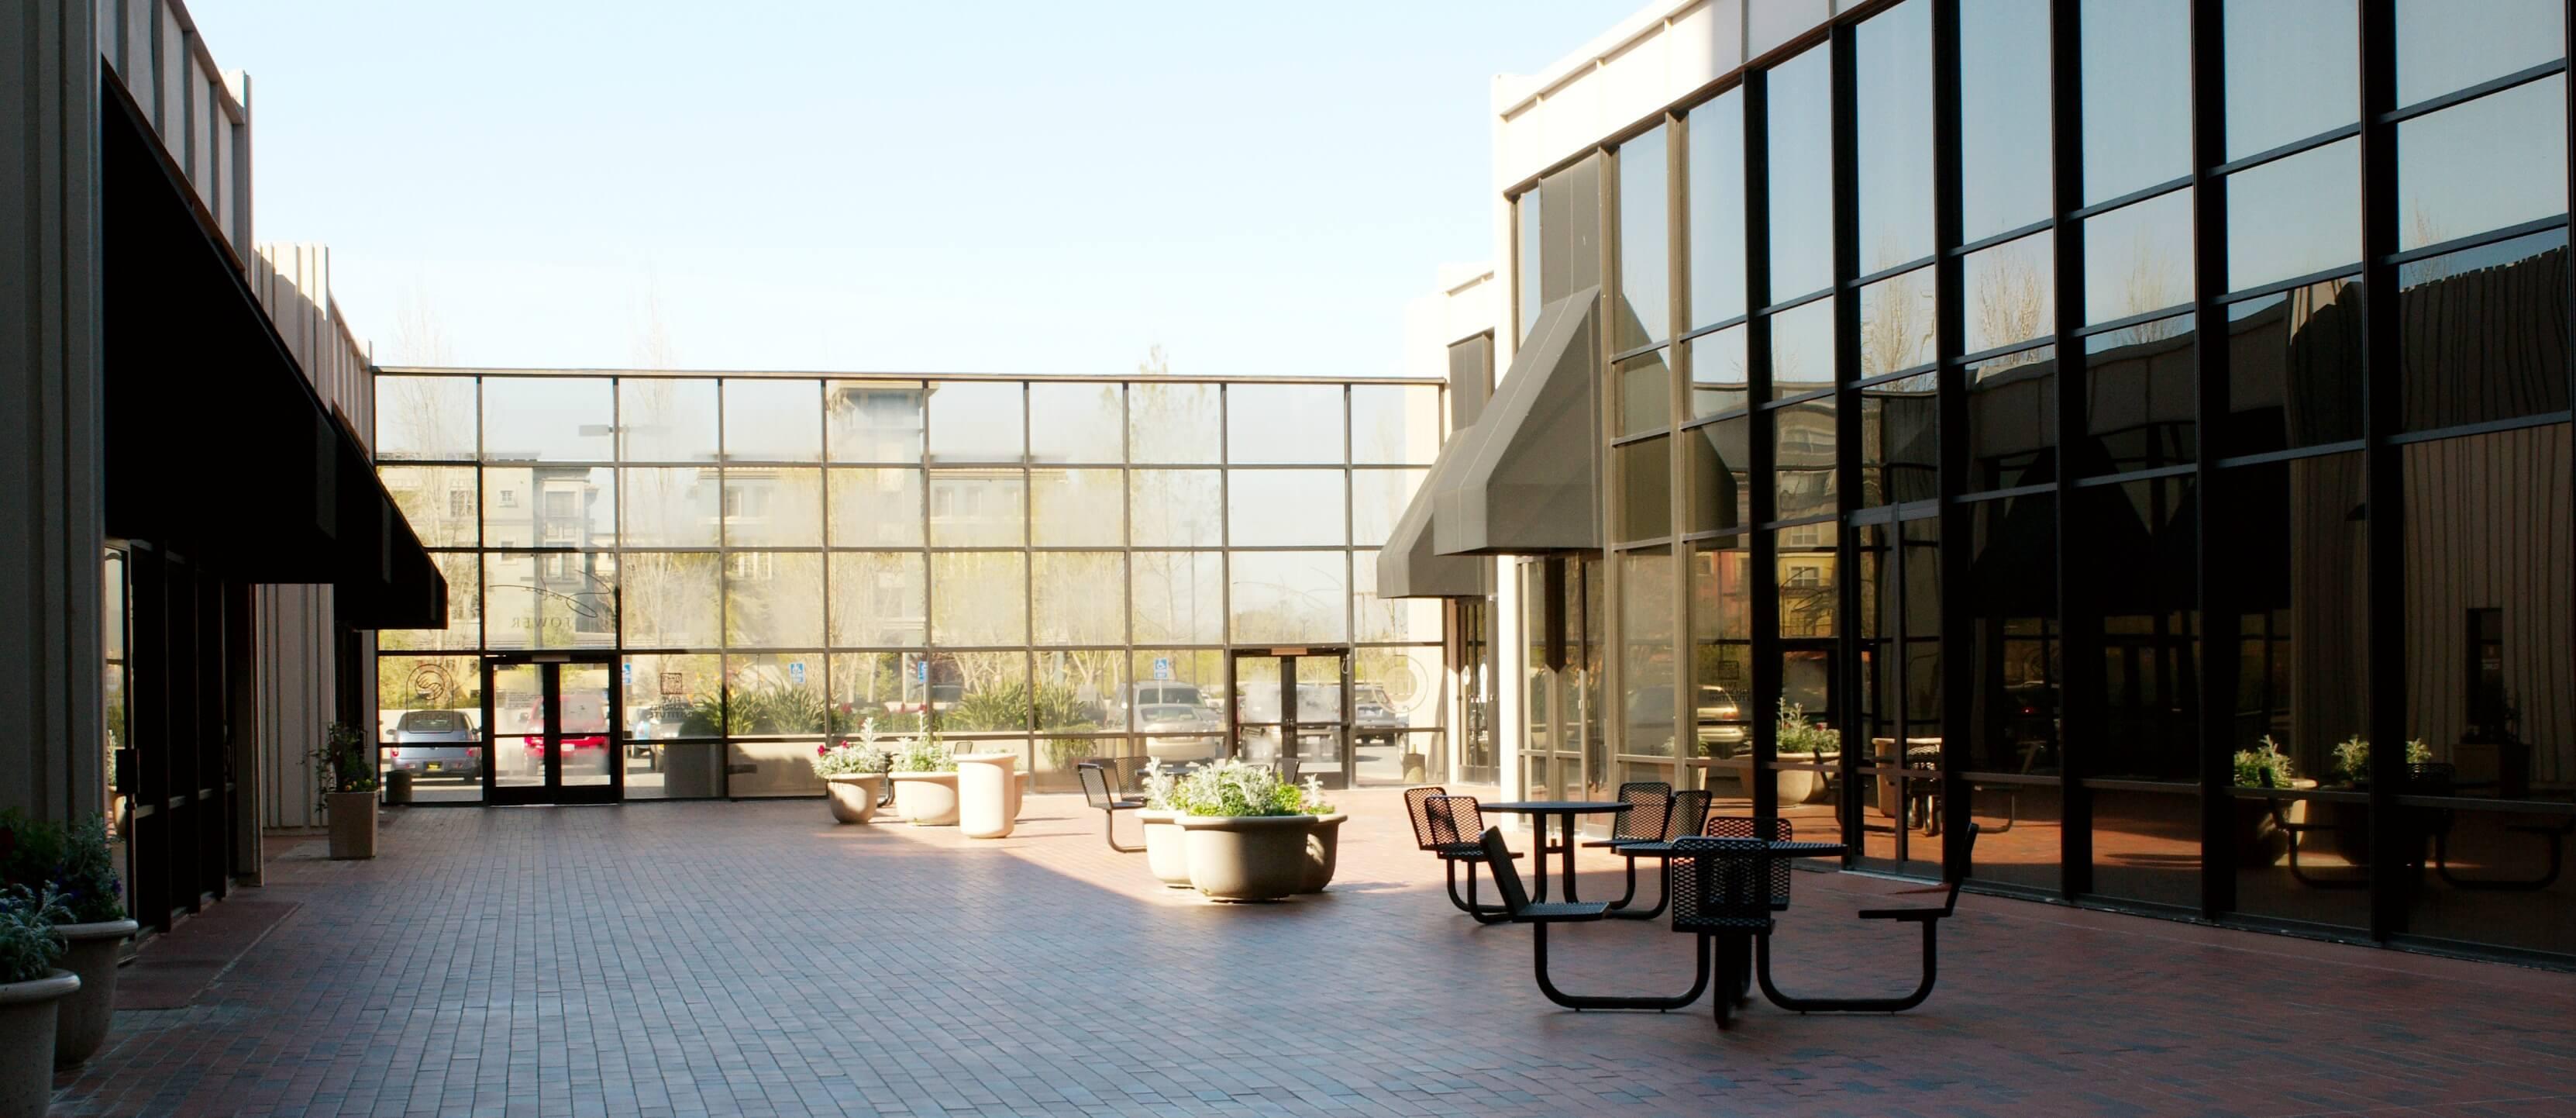 San Jose 1  Five Branches University  Five Branches